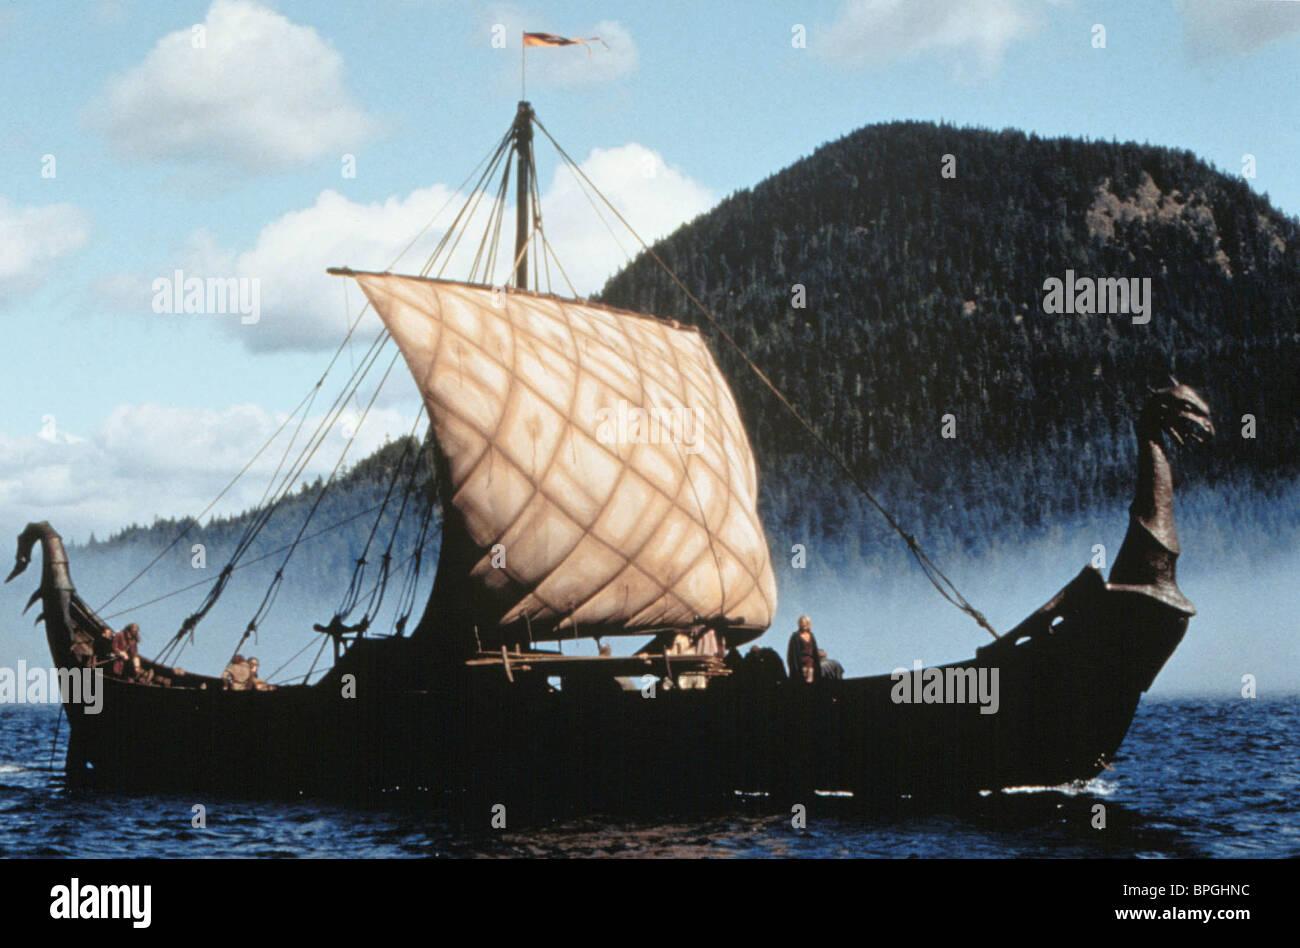 VIKING SHIP THE 13TH WARRIOR (1999 Stock Photo: 31097960 ...